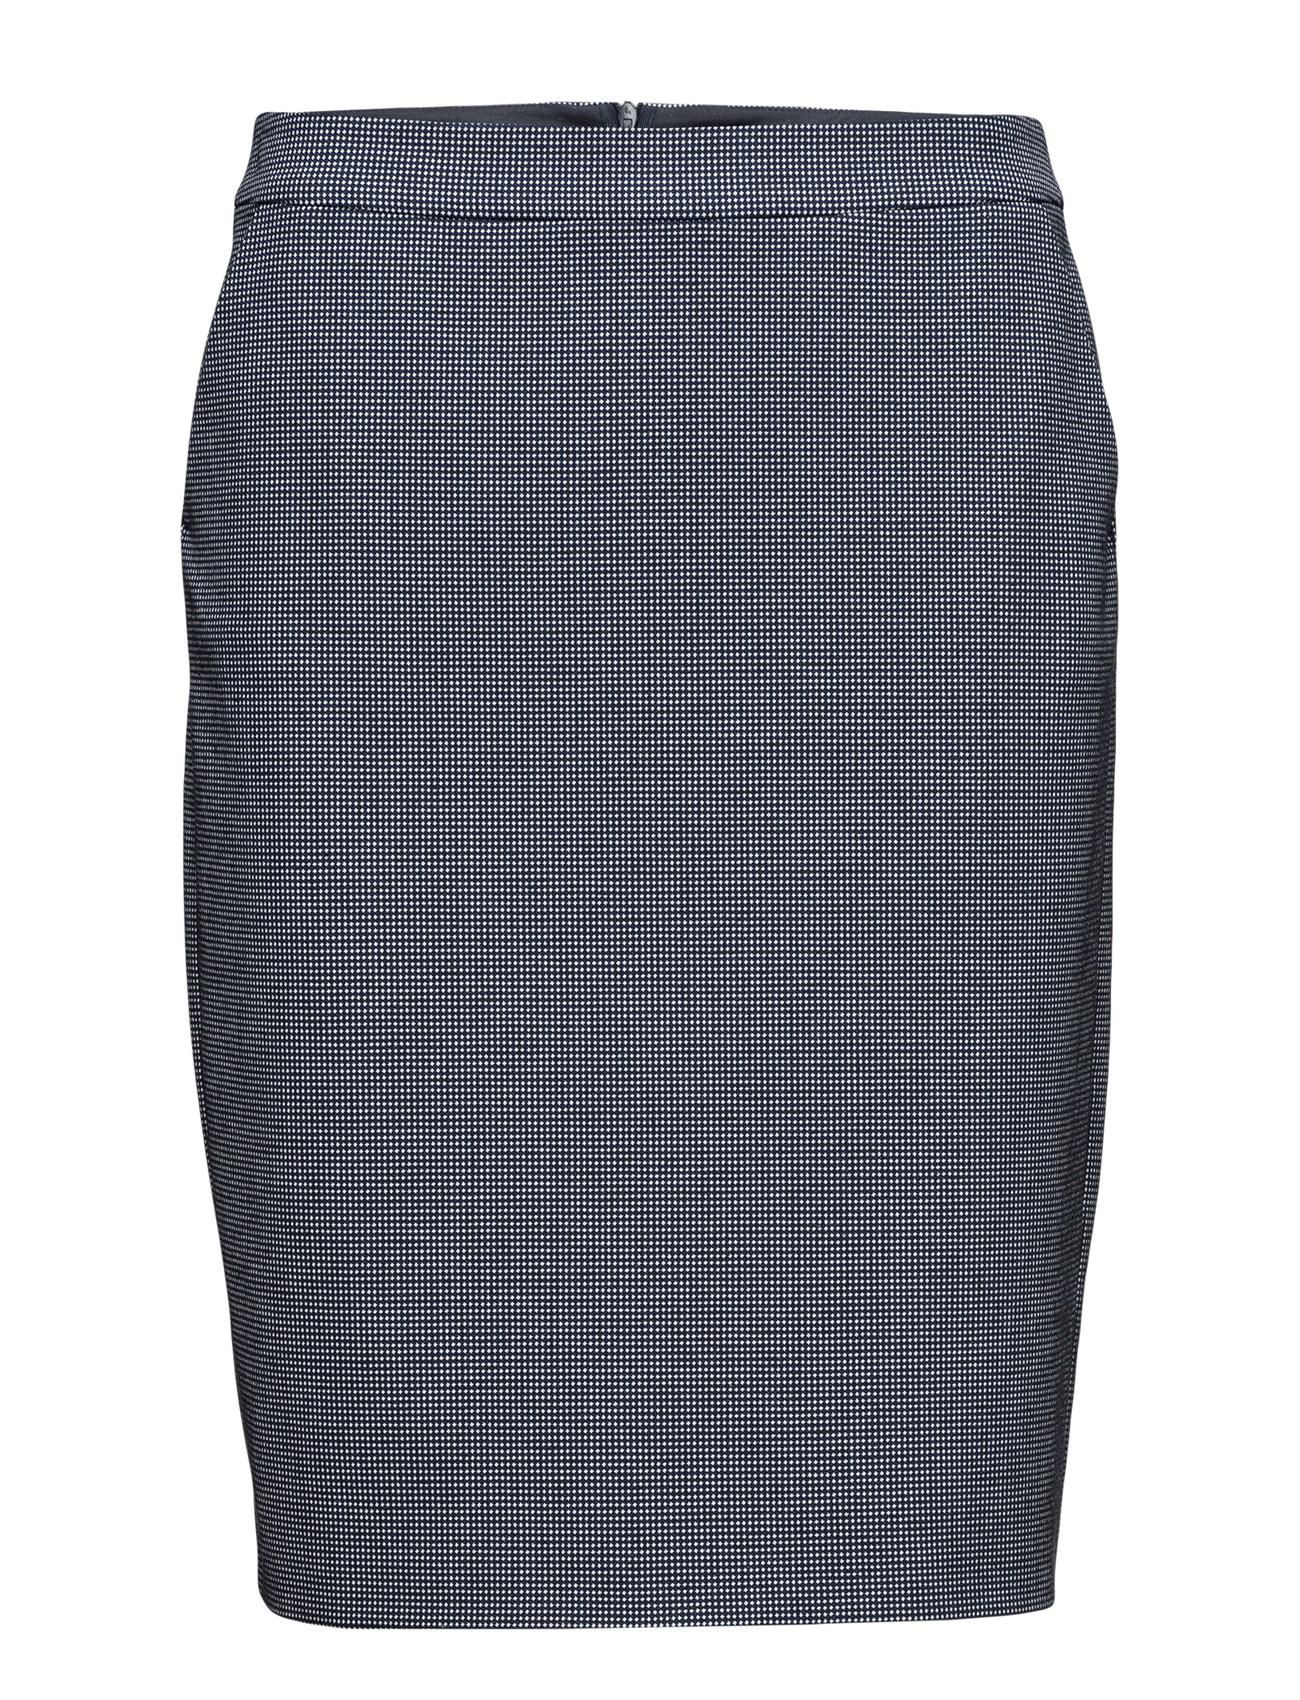 Skirt Short Woven Fa Gerry Weber Nederdele til Kvinder i